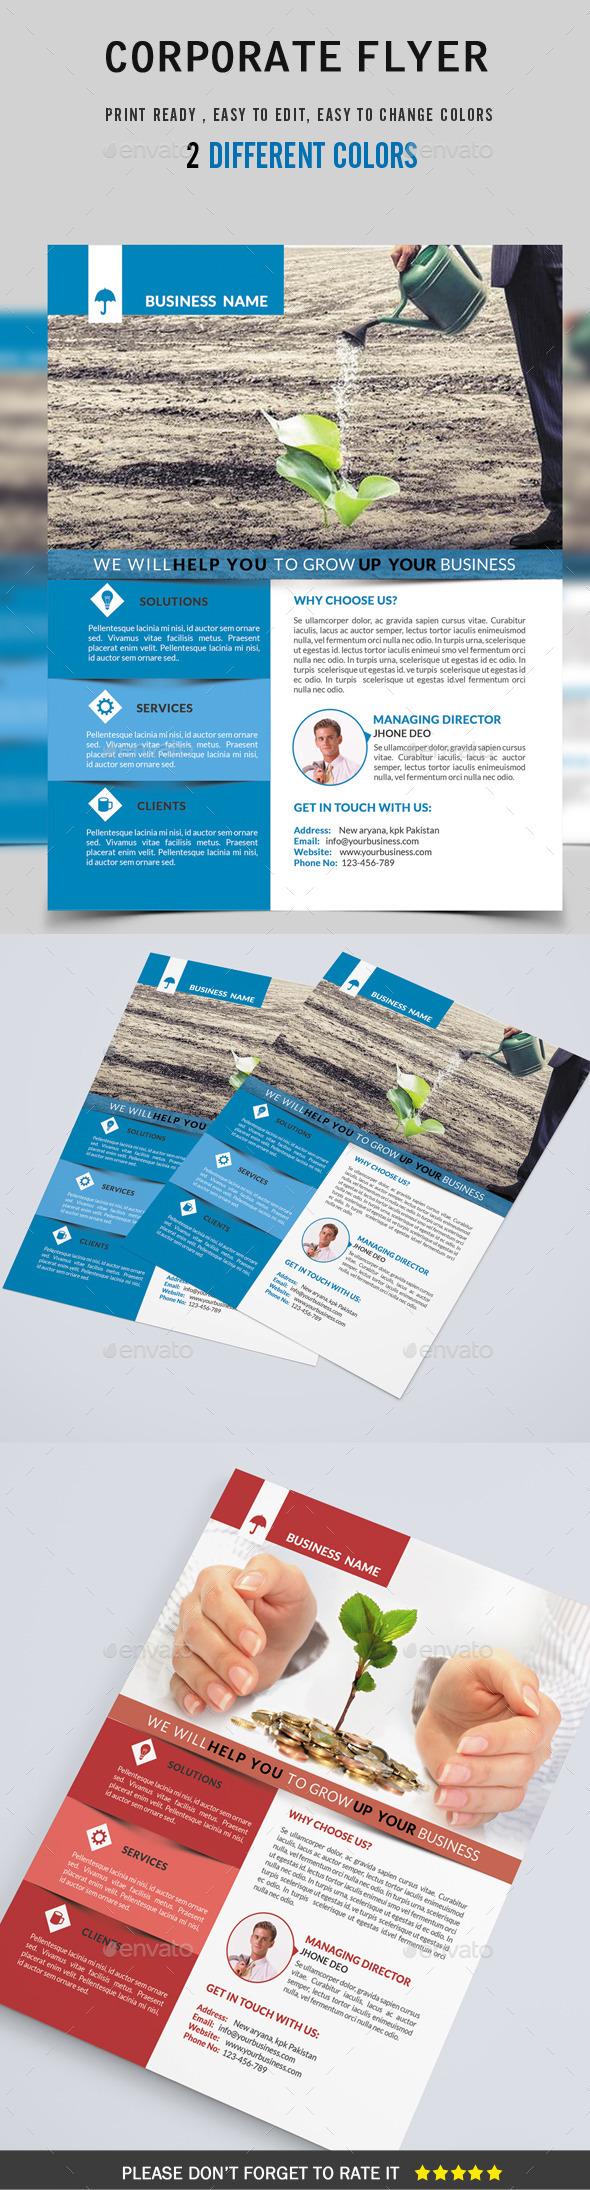 GraphicRiver Corporate Flyer 9007392